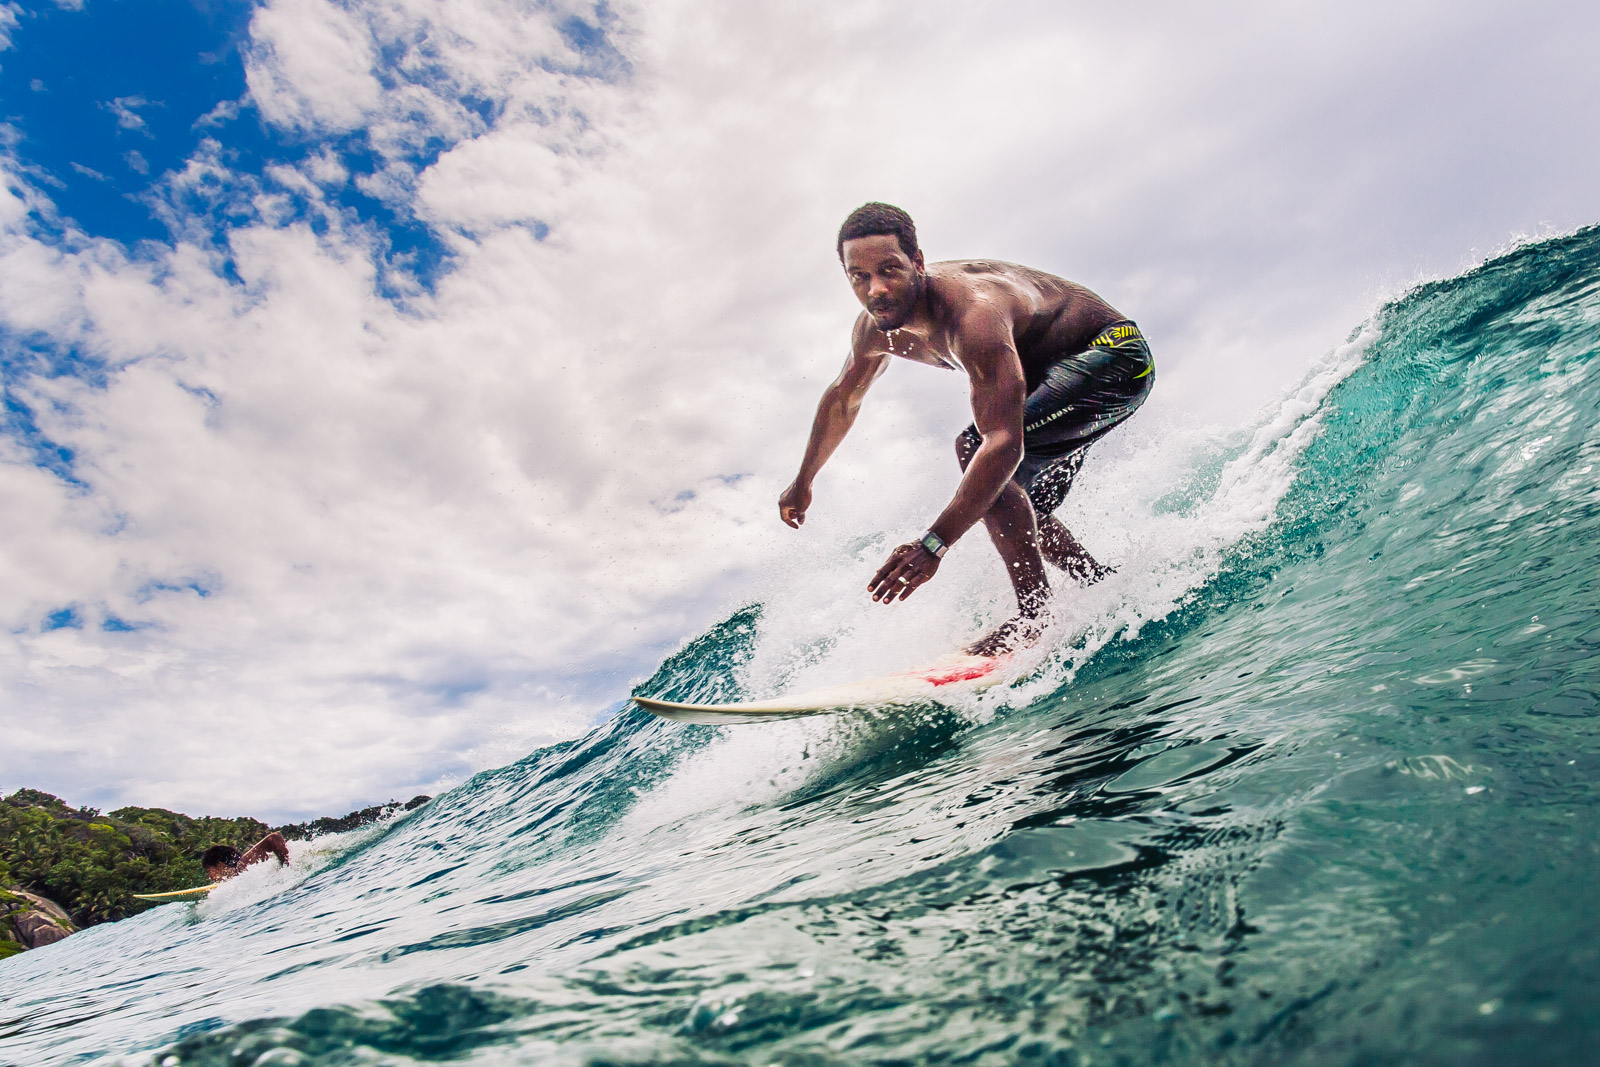 color, fotograf, isurf, photographer, seychellerna, seychelles, surf, surf photographer, surffotograf, surfphoto